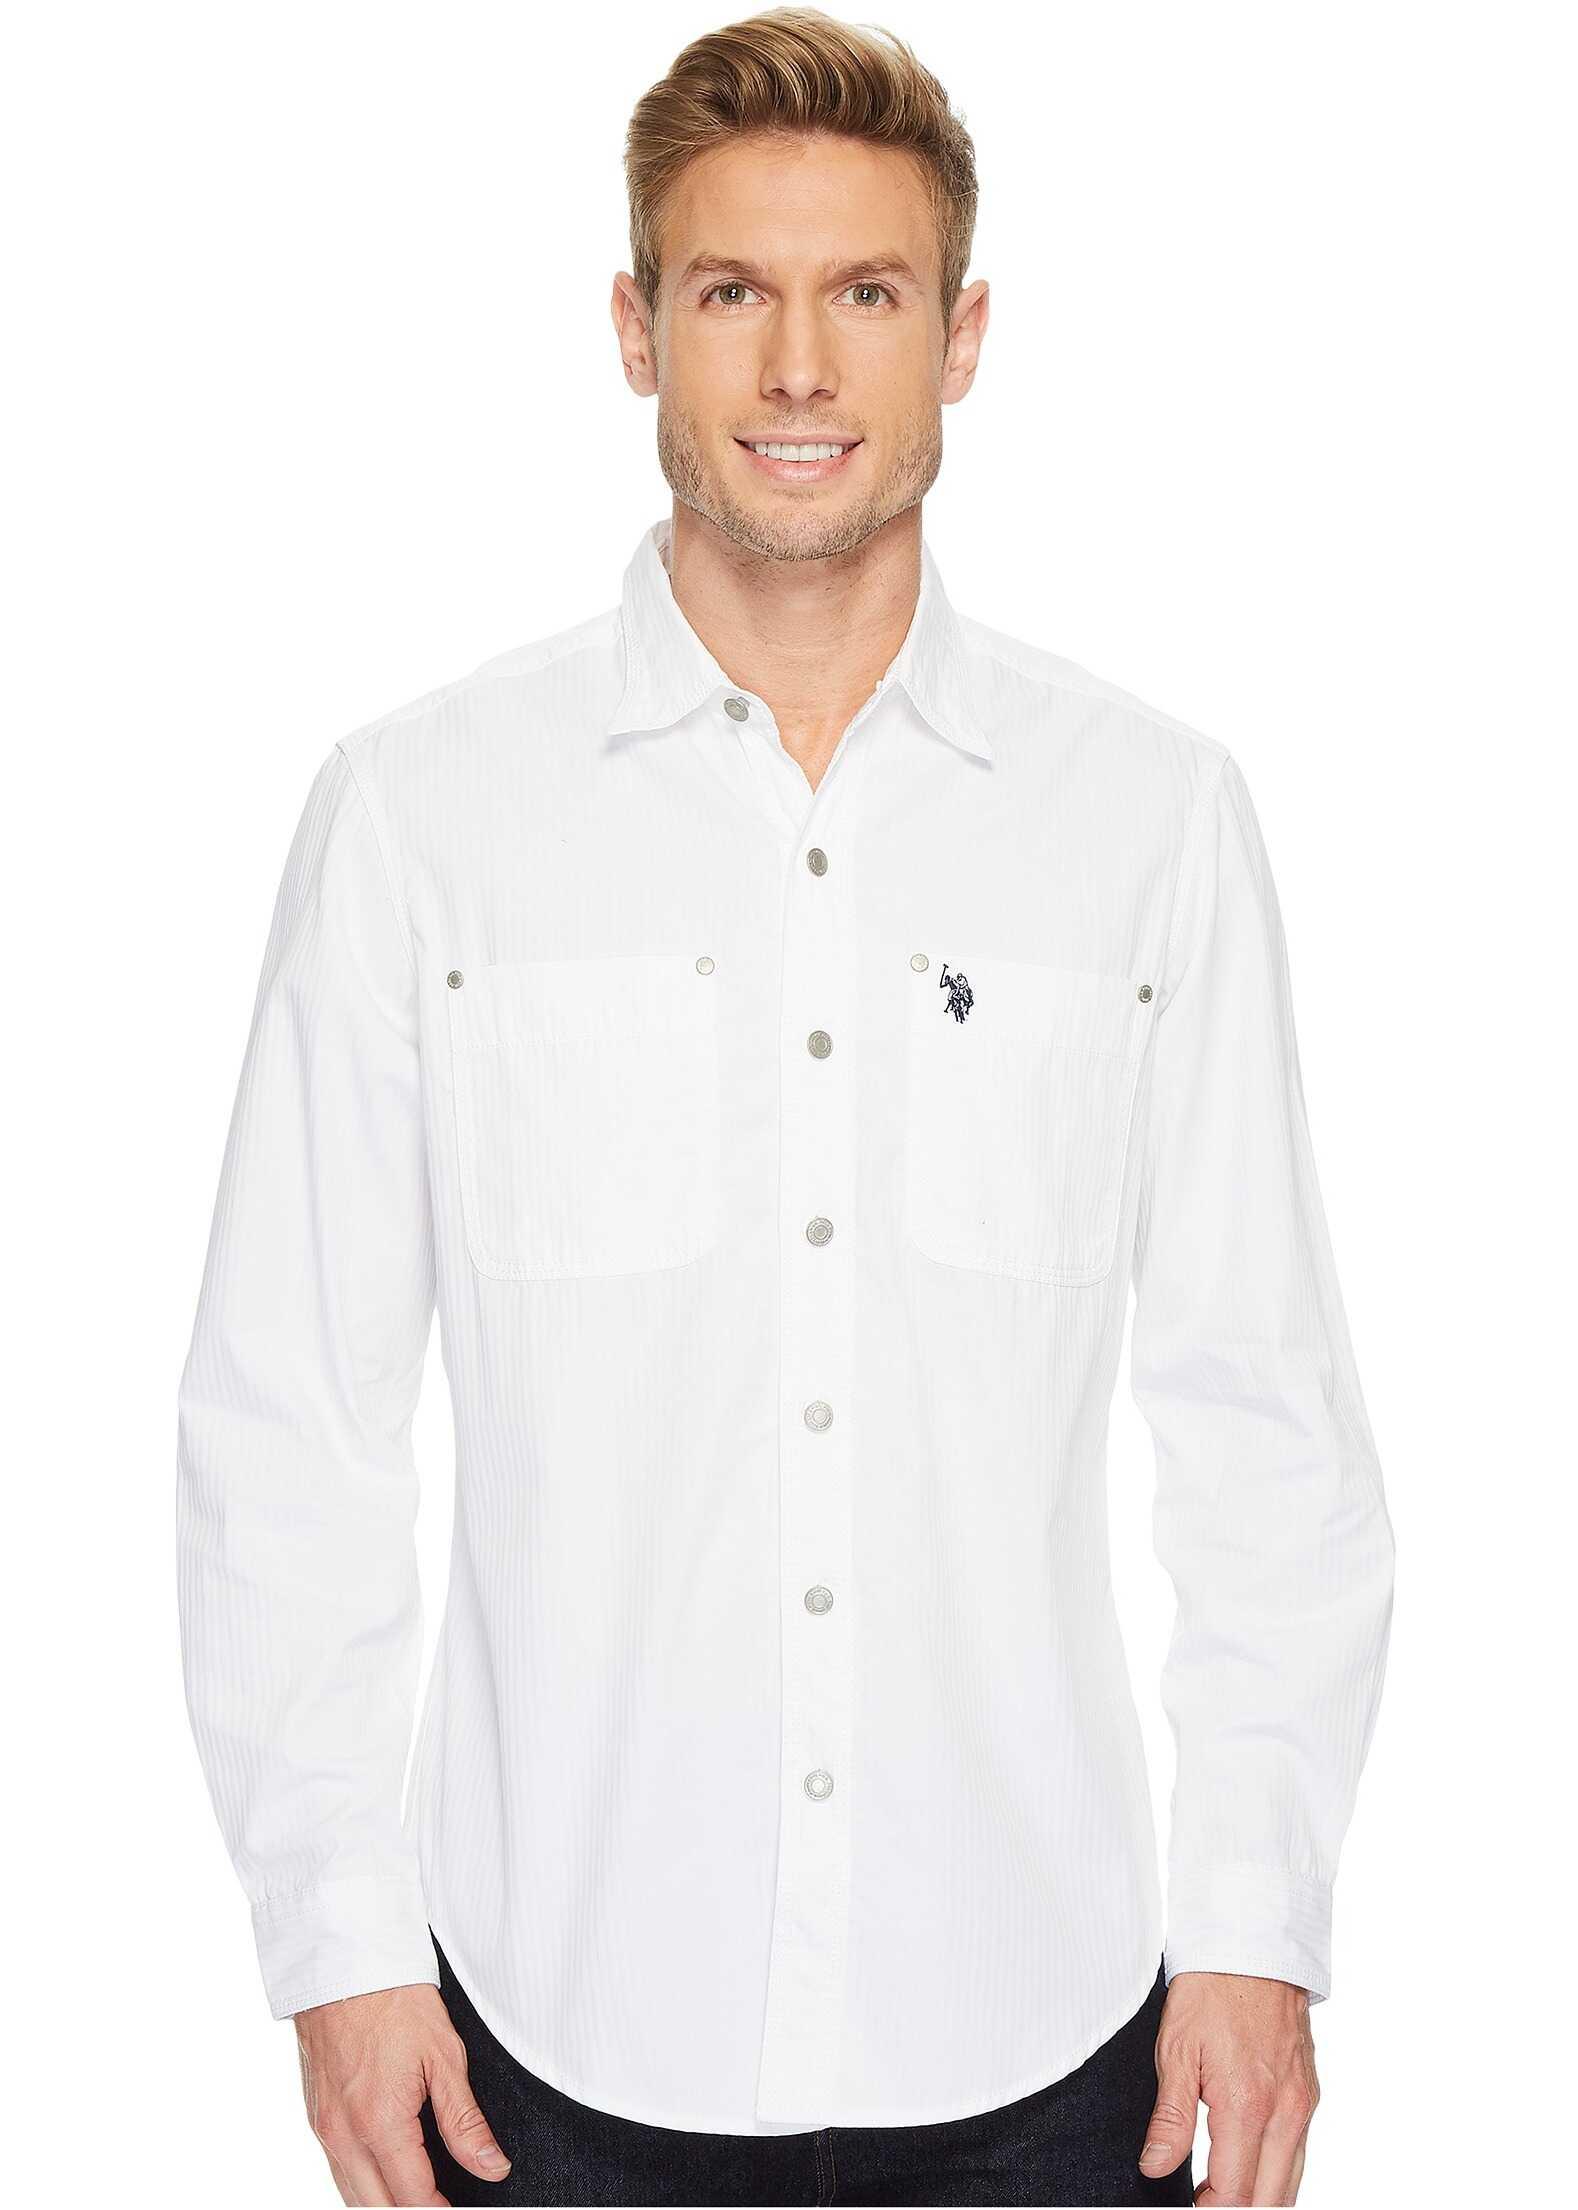 U.S. POLO ASSN. Long Sleeve Dobby Sport Shirt White